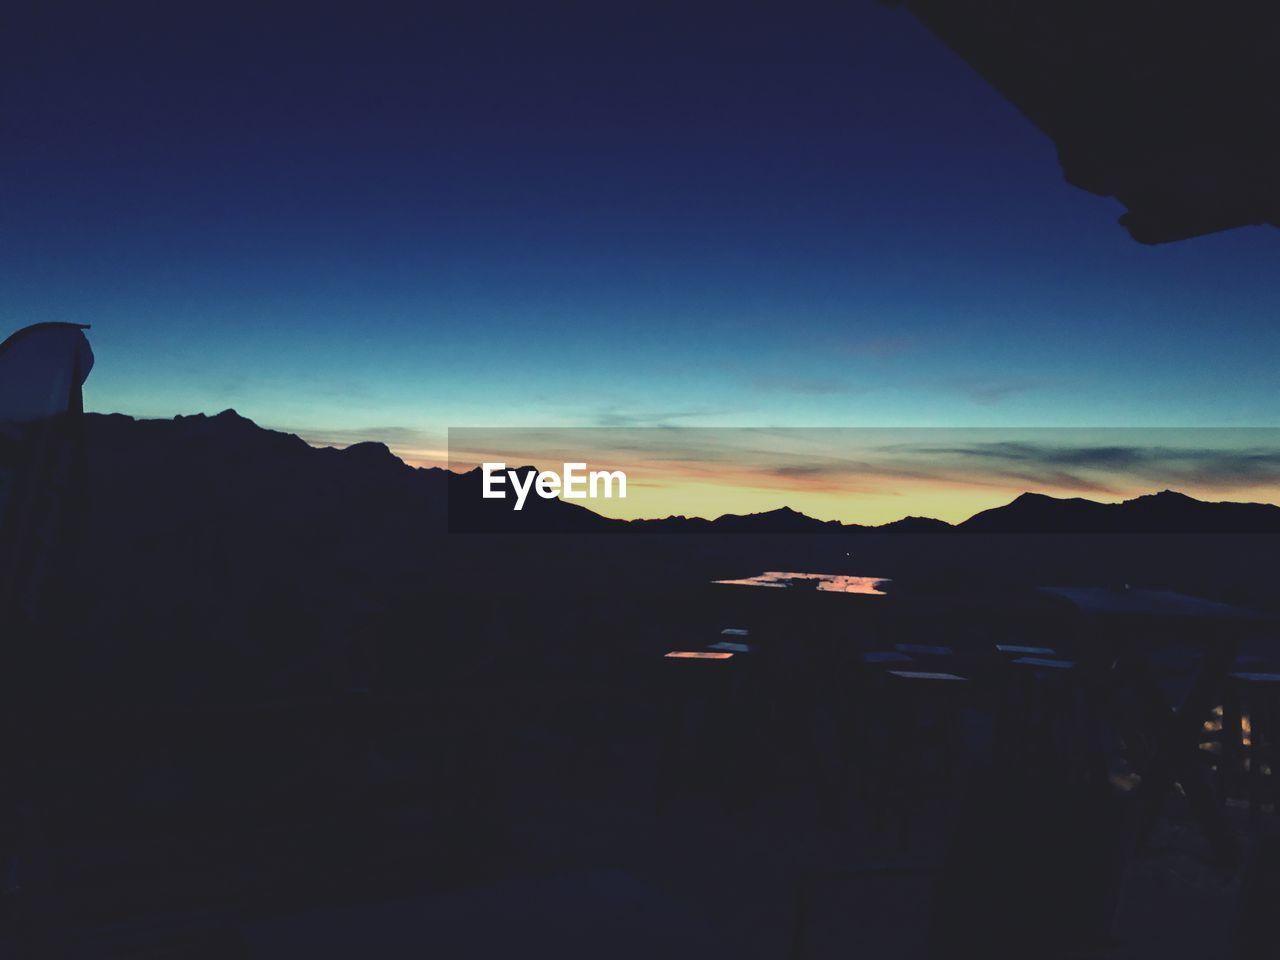 mountain, sky, silhouette, scenics - nature, beauty in nature, sunset, nature, tranquil scene, tranquility, mountain range, copy space, no people, outdoors, landscape, idyllic, environment, non-urban scene, cloud - sky, blue, dusk